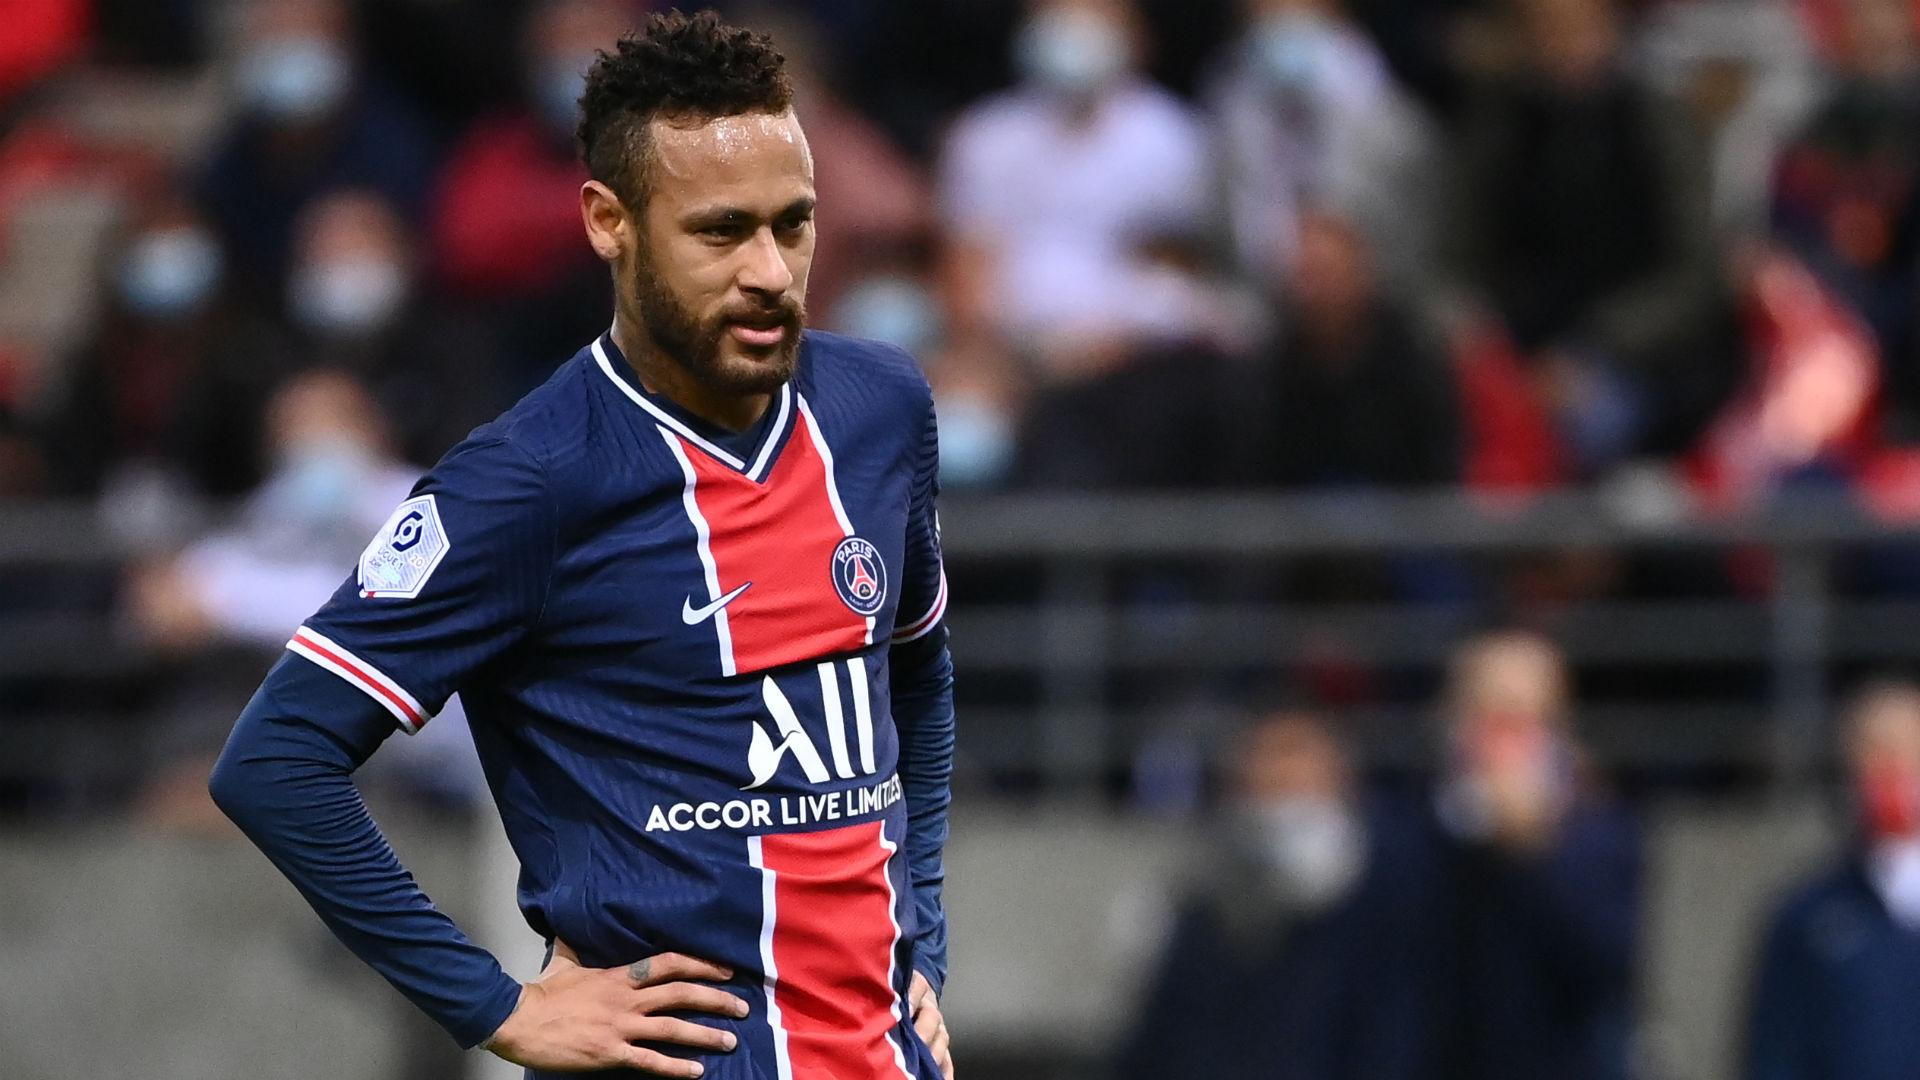 PSG reveal positive Neymar injury prognosis as Bernat recovers from surgery